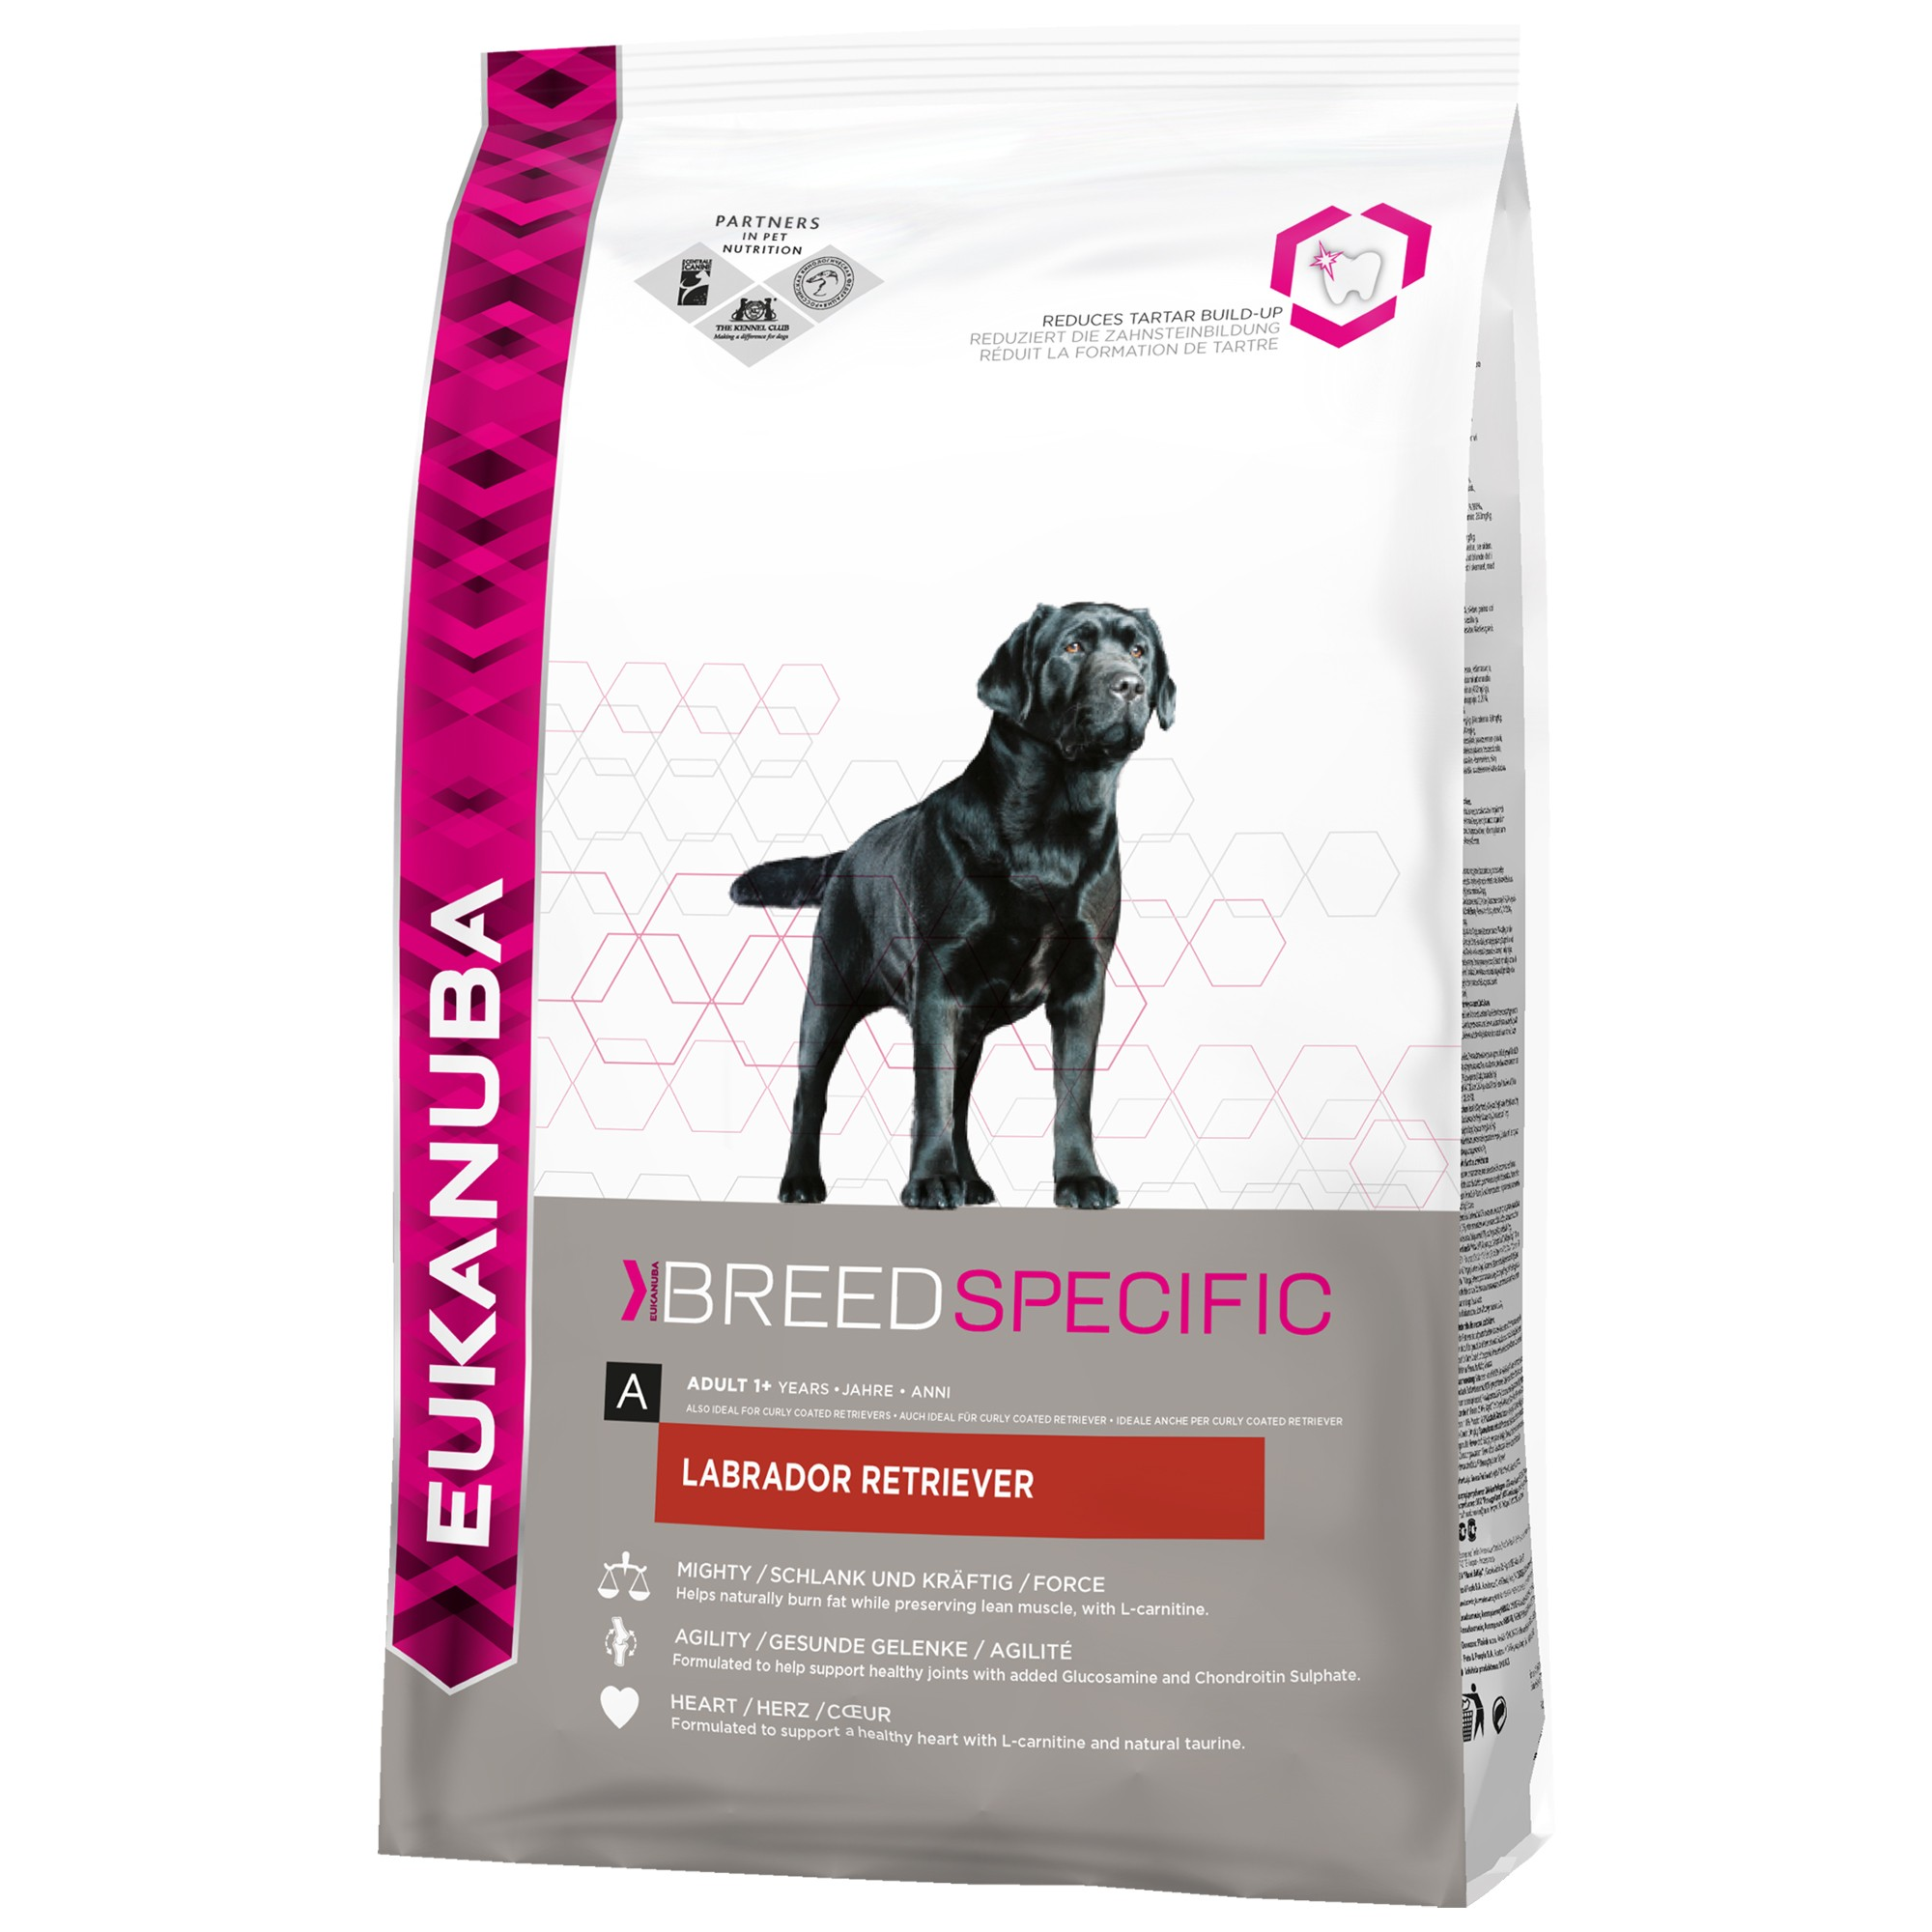 Eukanuba Breed Specific Labrador Retriever pour chien